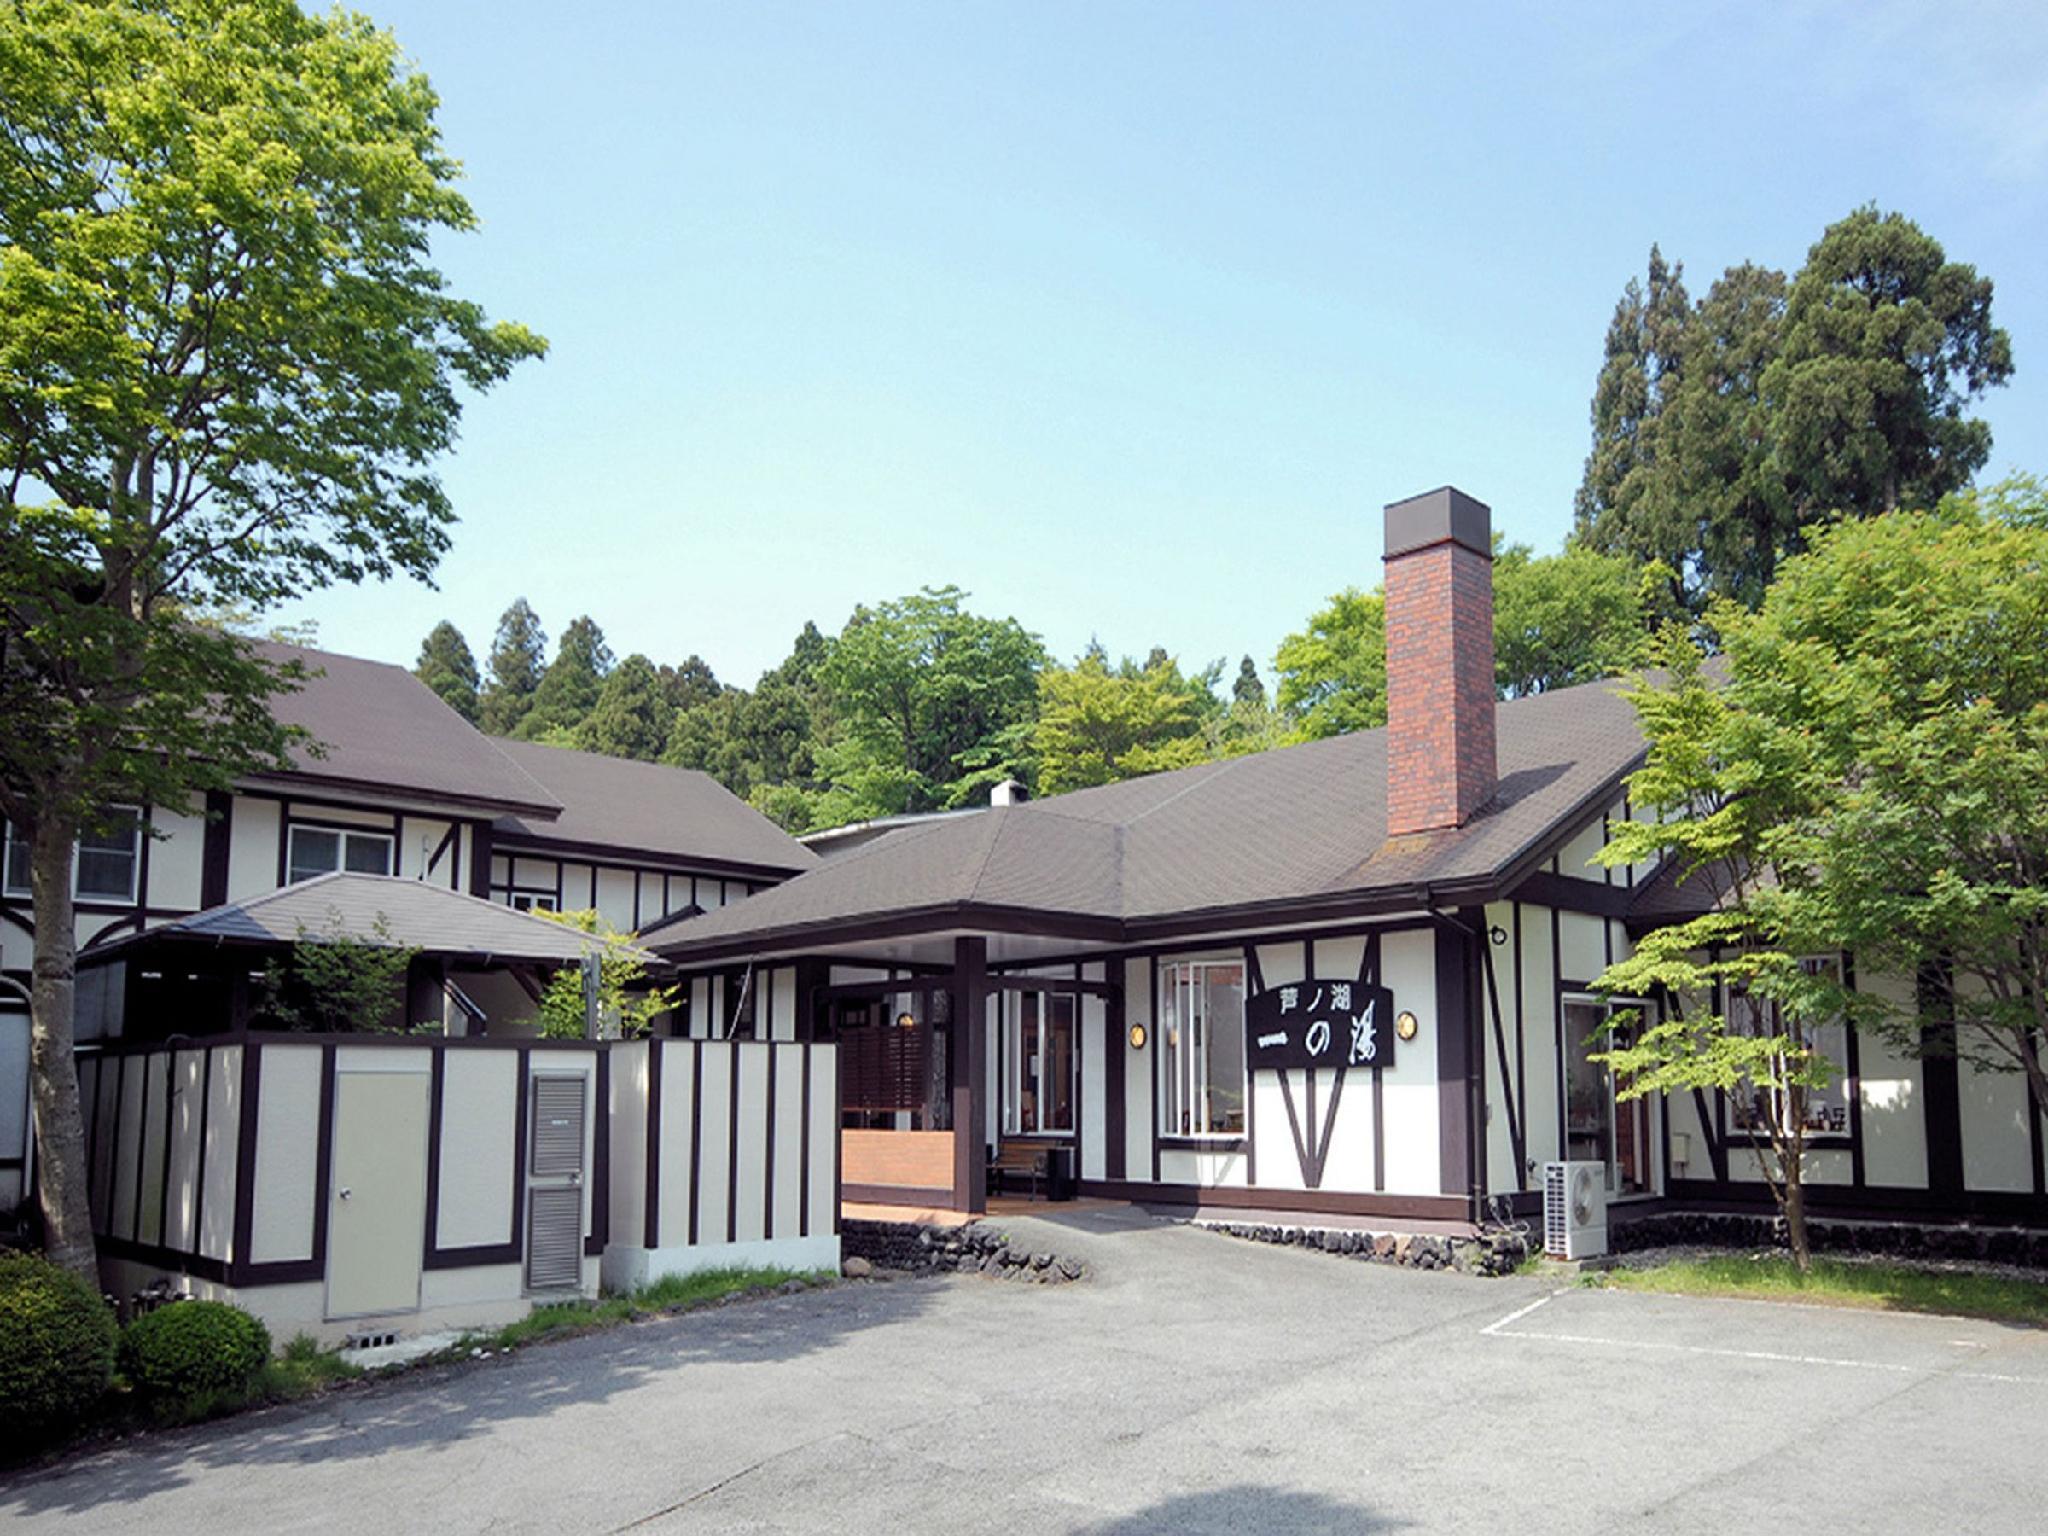 Ashinoko Ichinoyu Hotel 芦之湖 一之汤旅馆